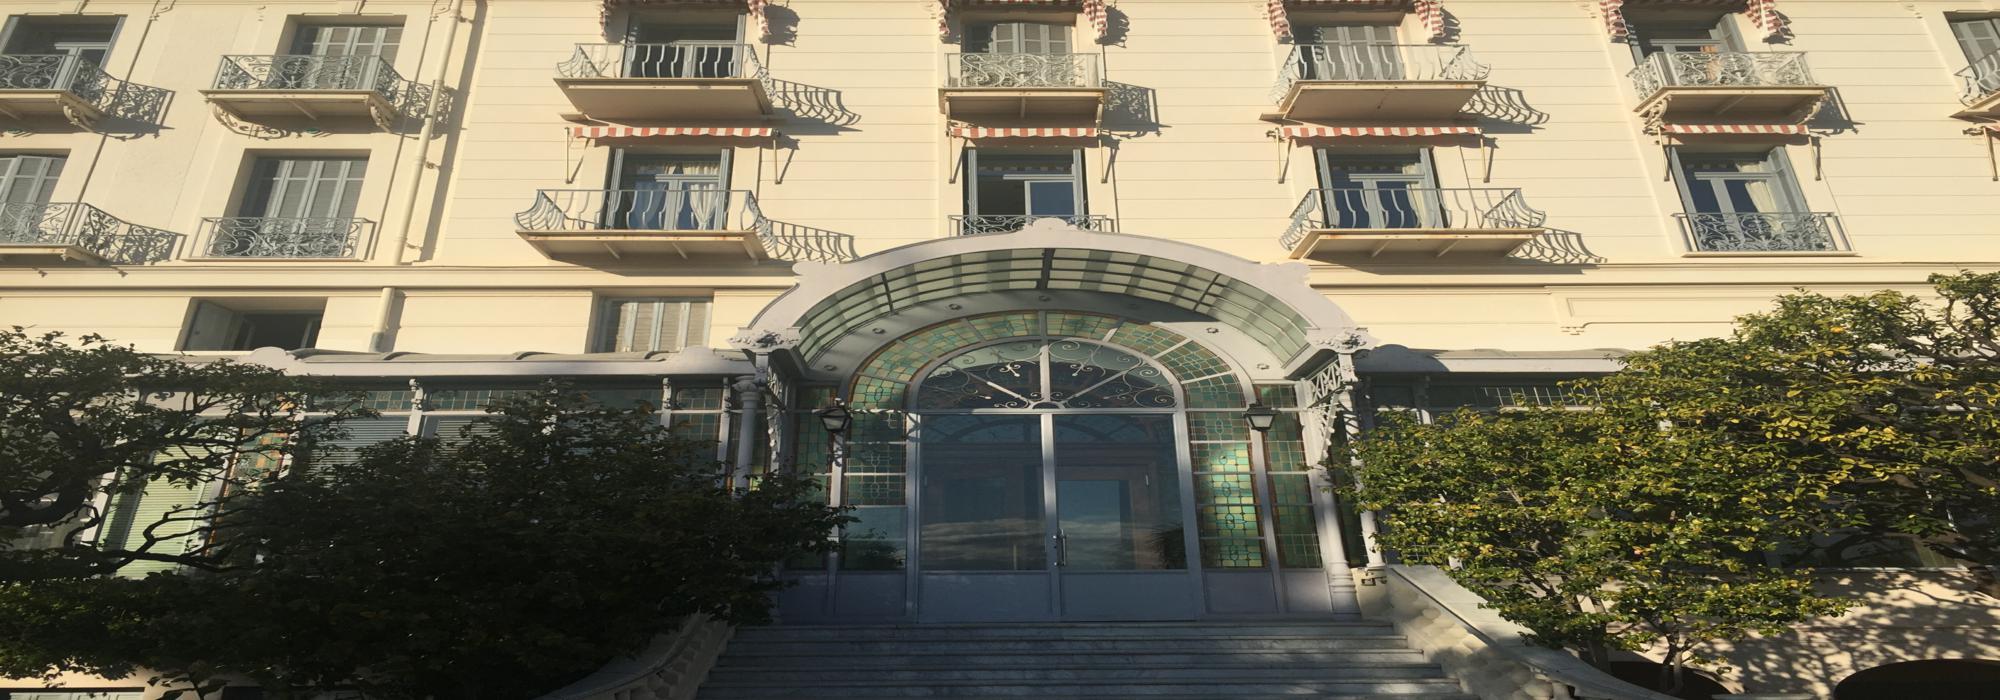 le Riviéra Palace